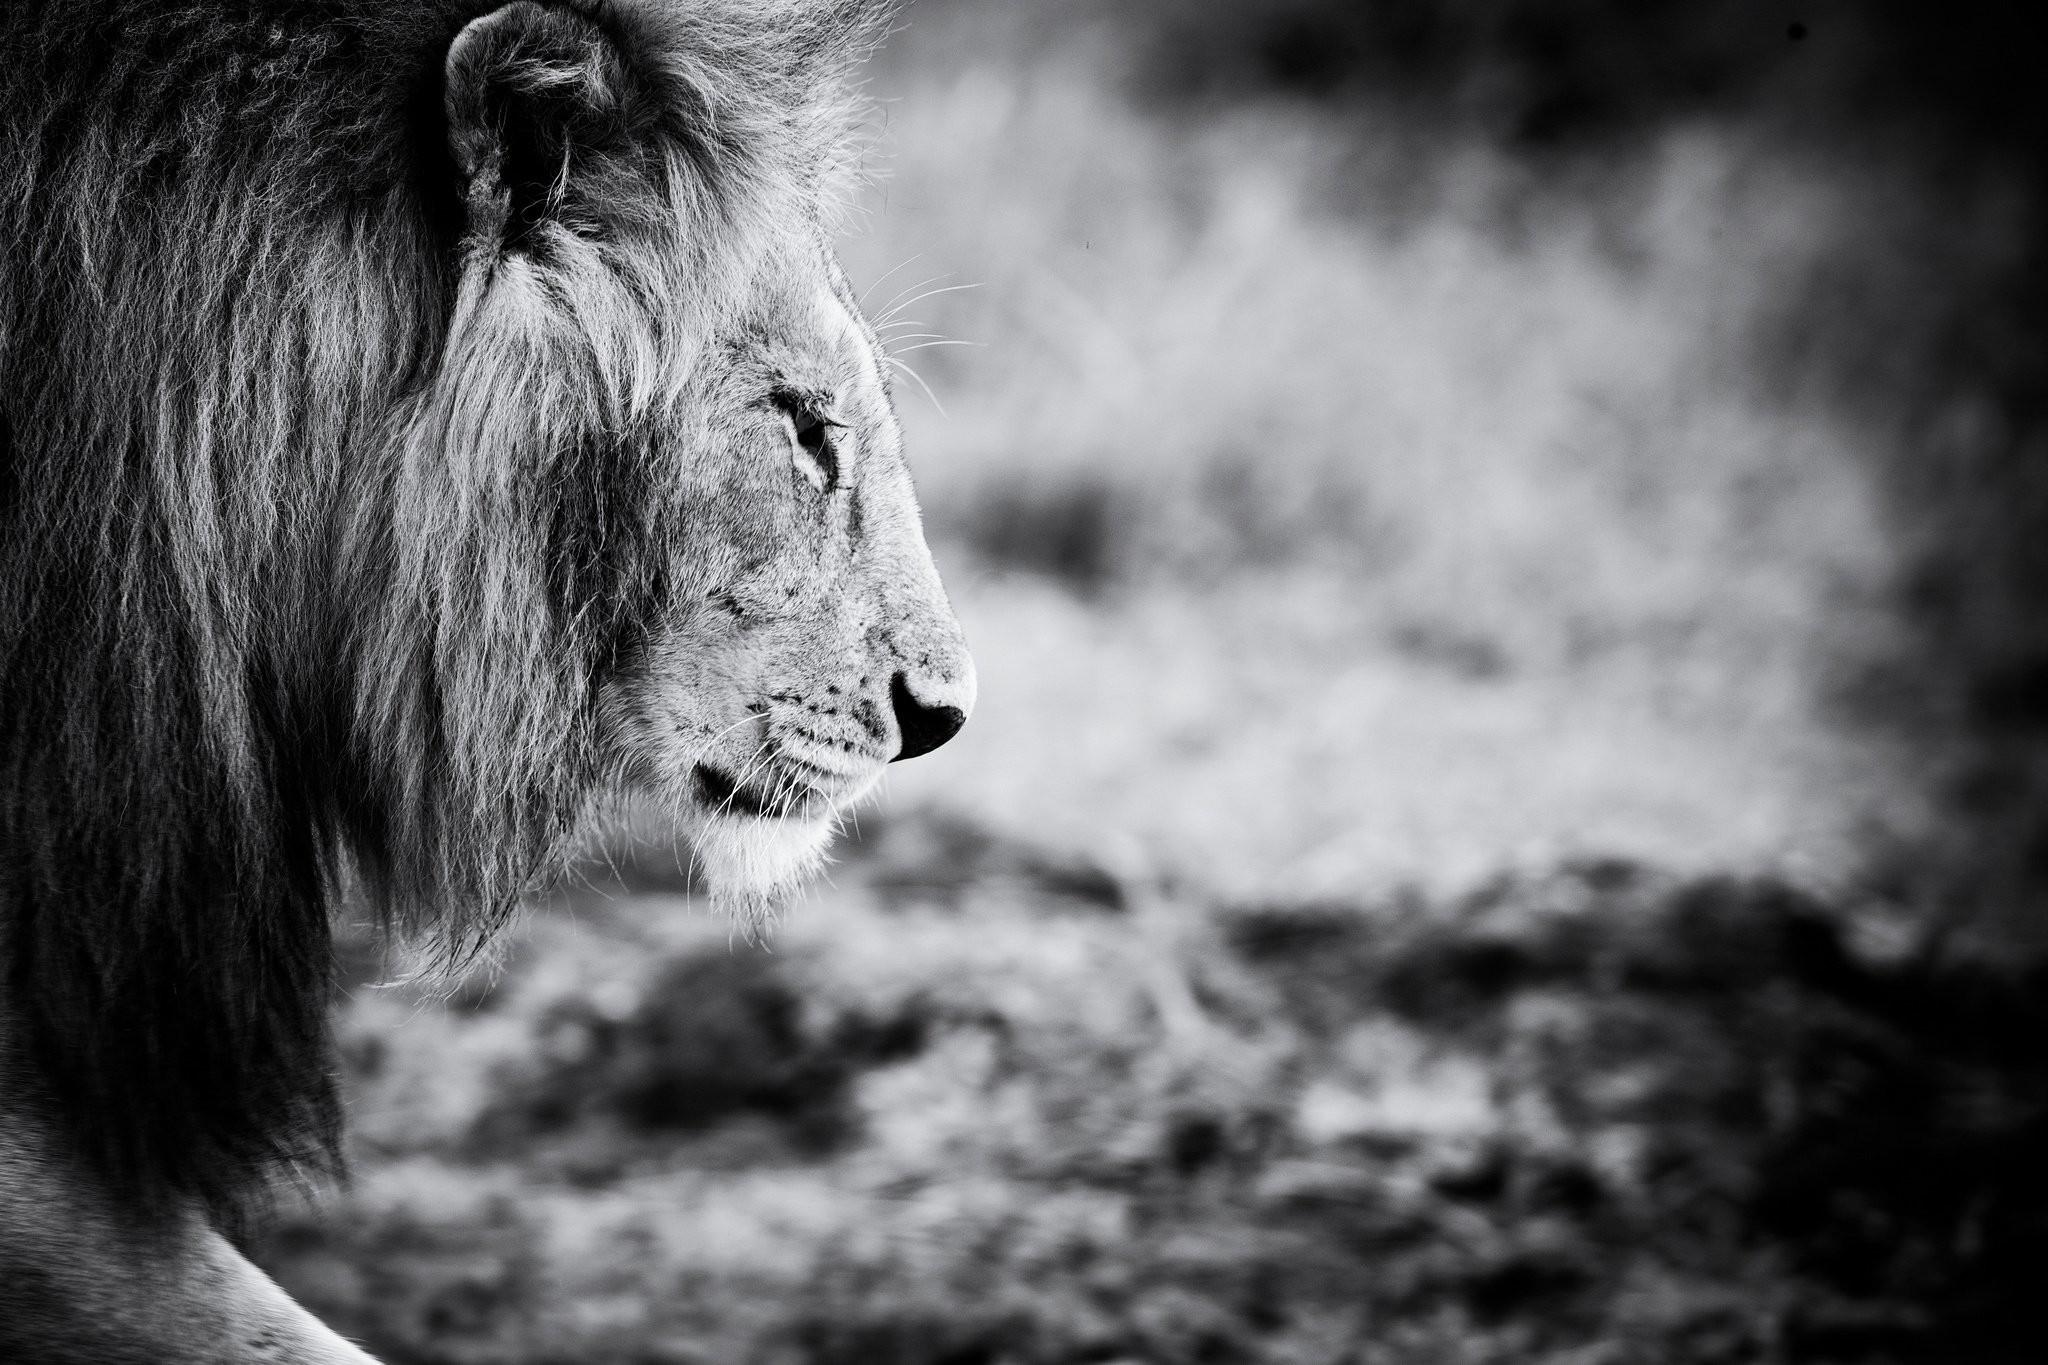 Lion black and white wallpaper – photo#22